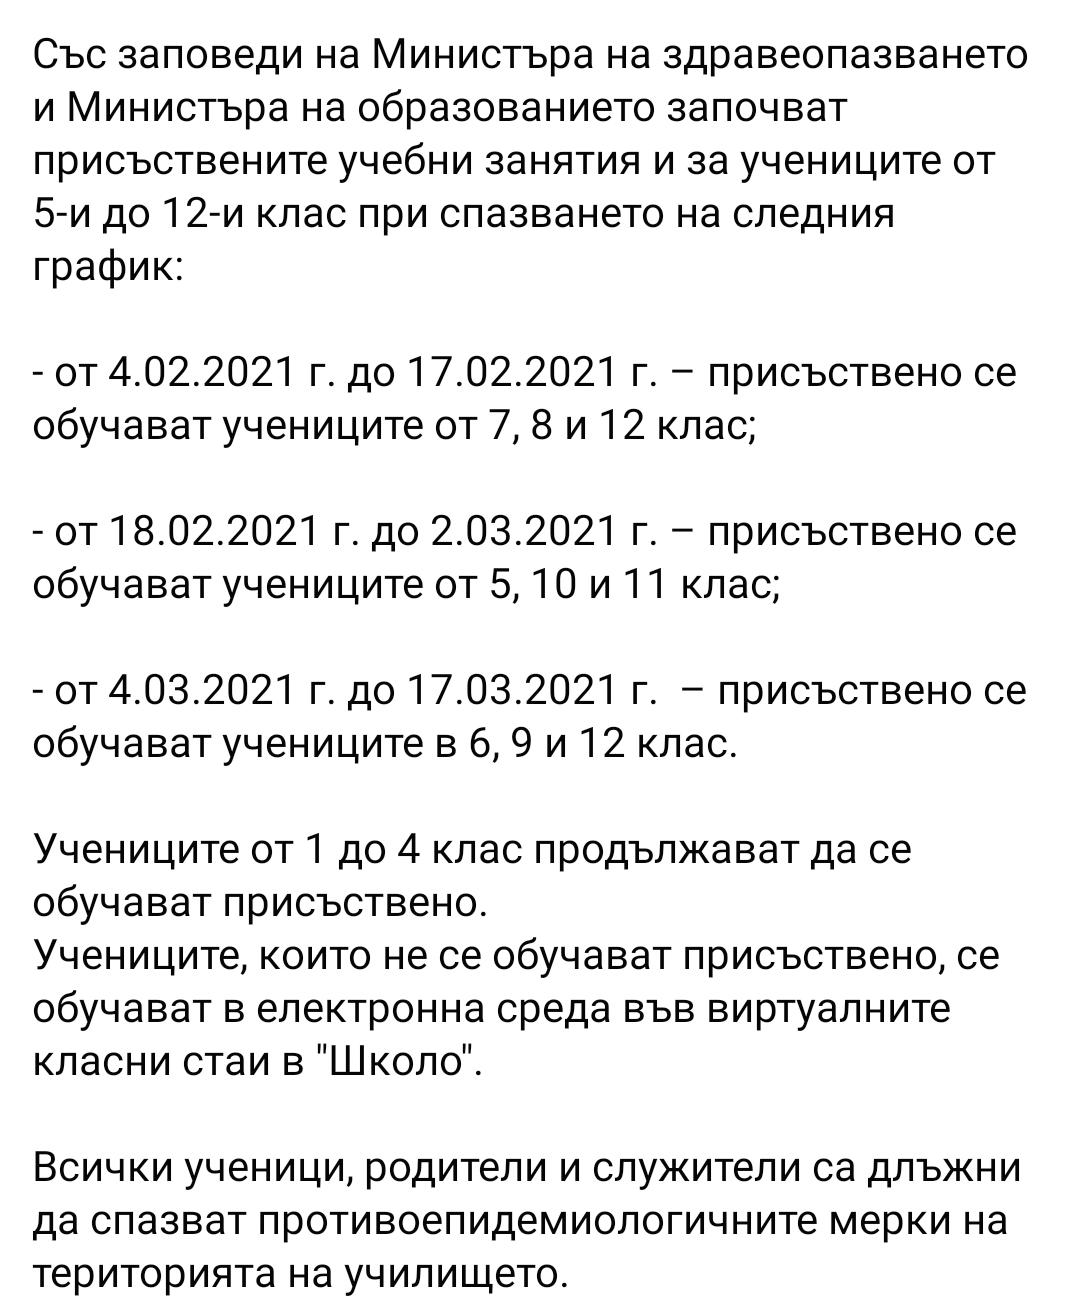 Screenshot_20210130-133858_Facebook